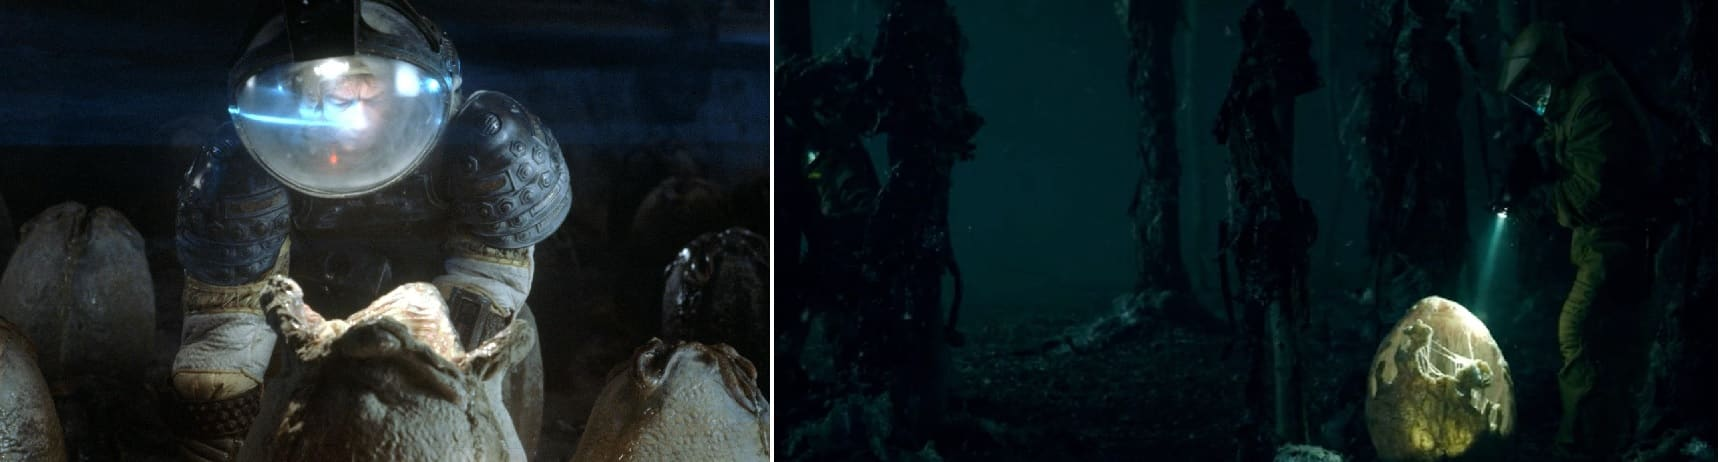 A la izquierda, Alien (1979), a la derecha, Stranger Things (2016).